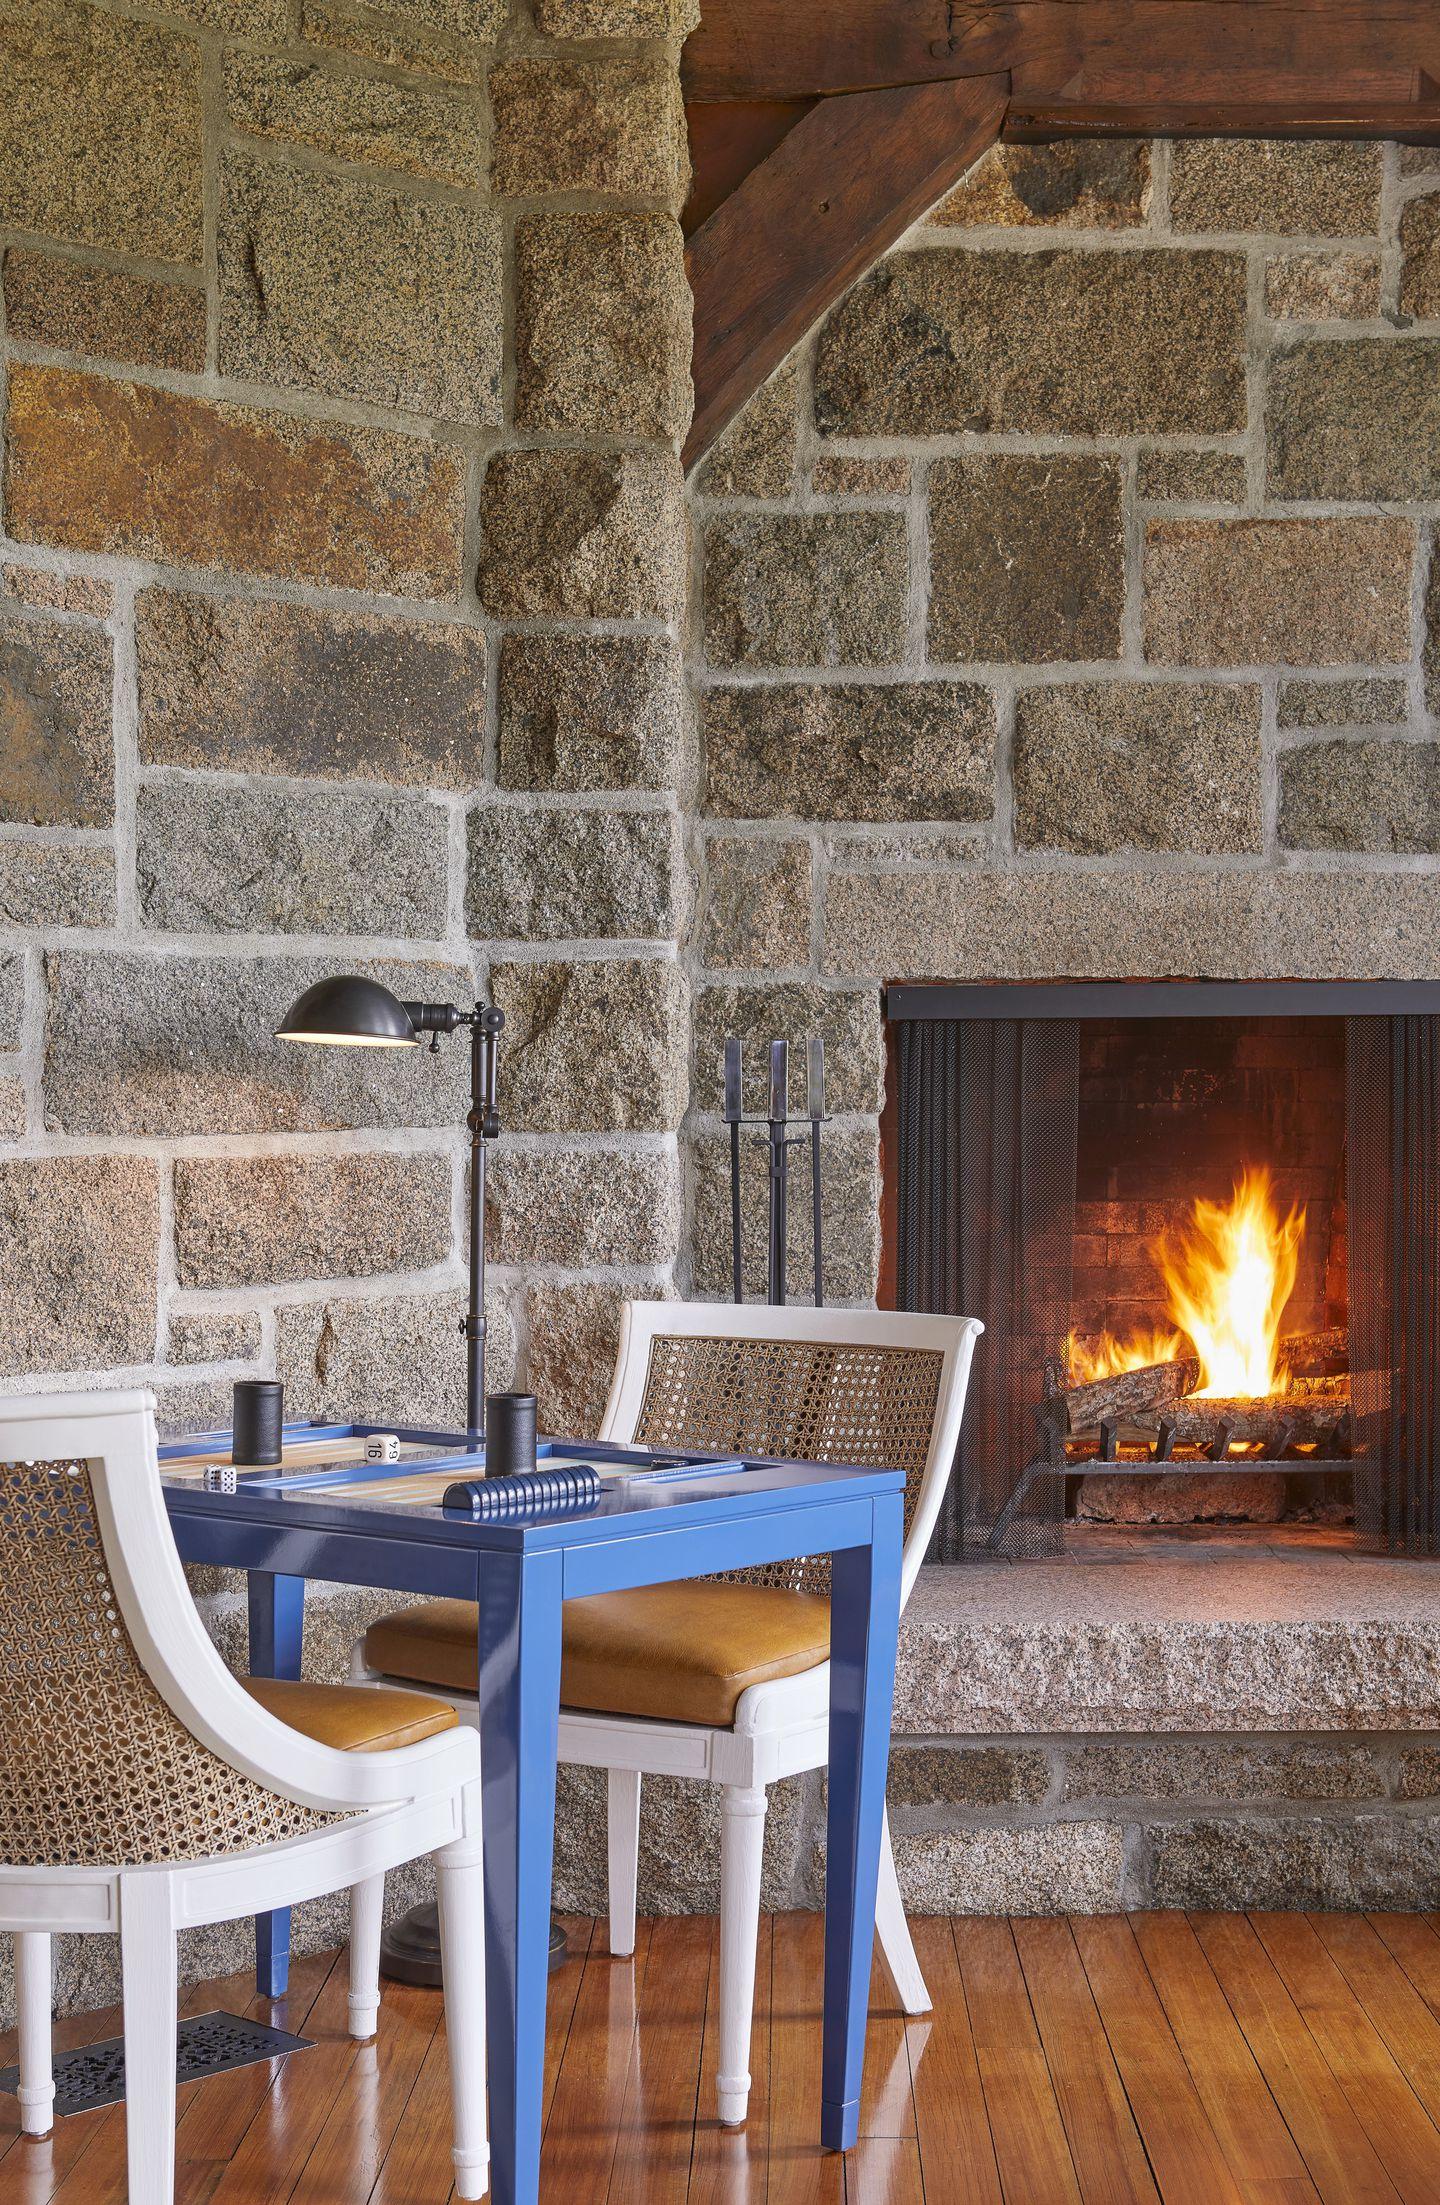 eastholm-emily-gilbert-fireplace